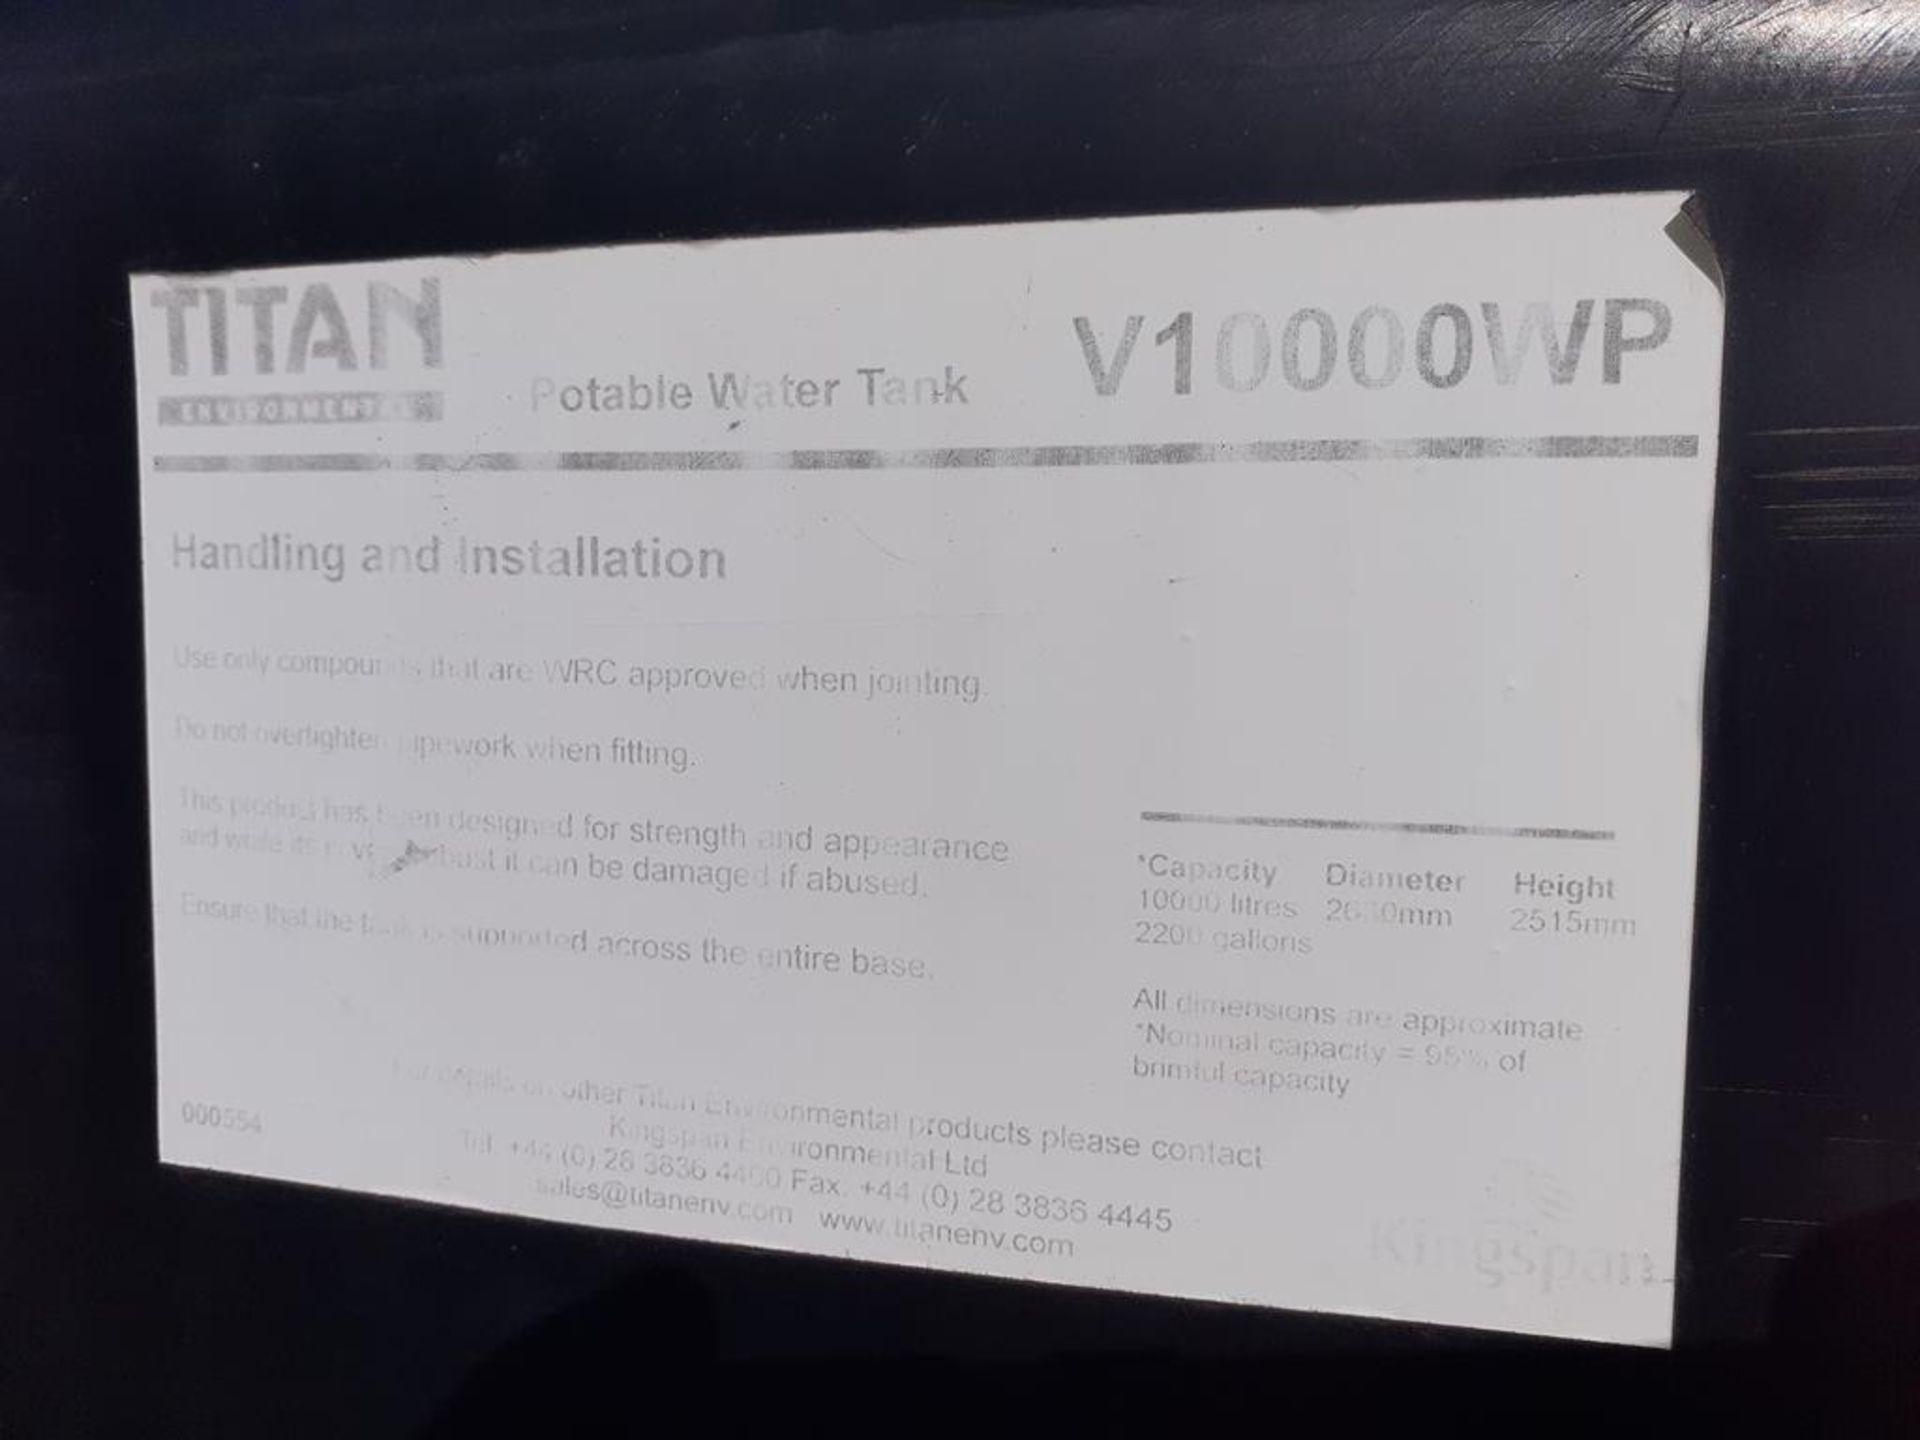 'Titan' 10,000L capacity portable water tank - Image 2 of 2